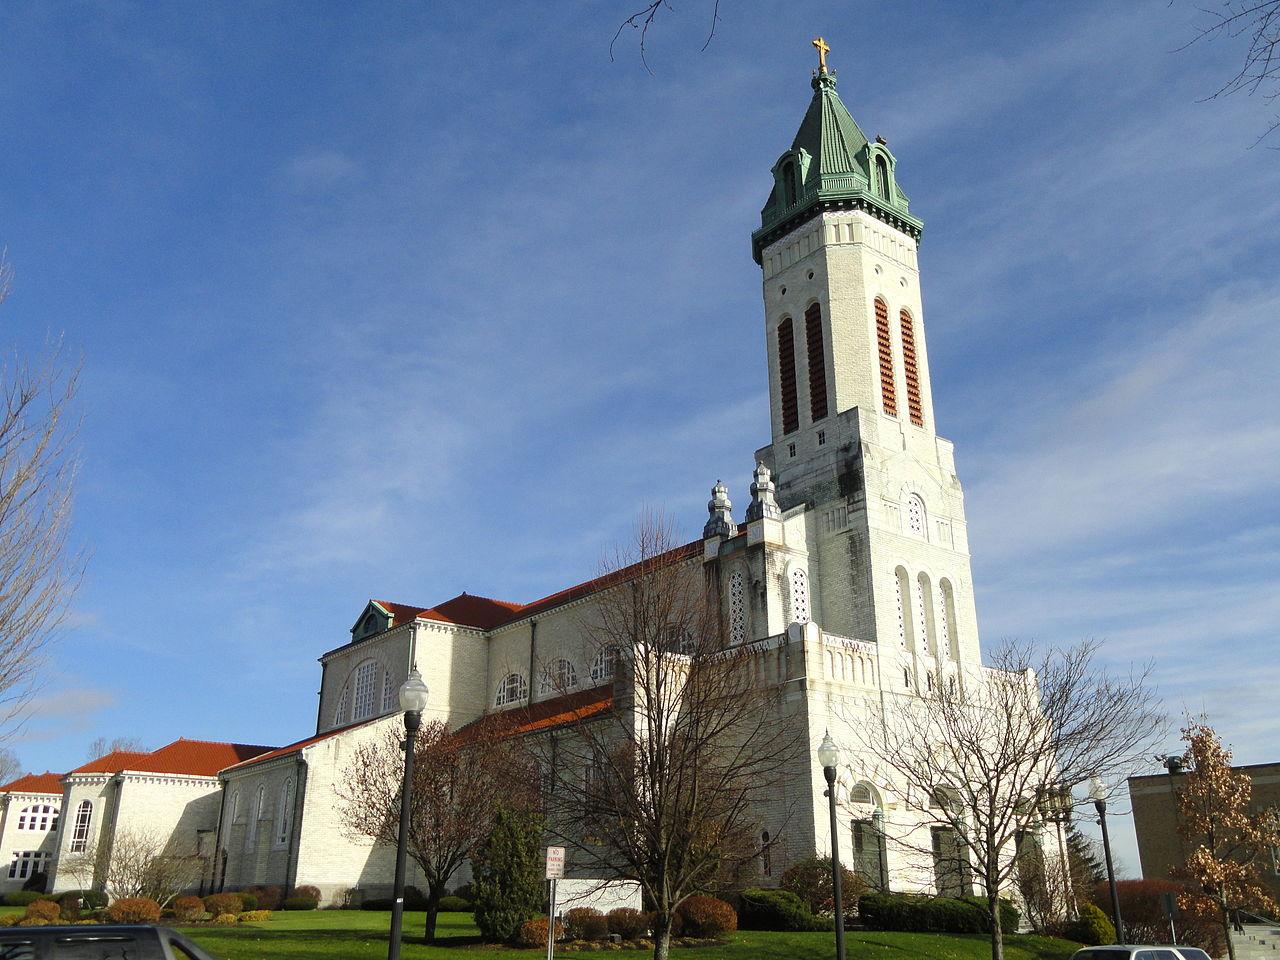 FileNotre Dame Catholic Church Southbridge MA  DSC02677JPG  Wikimedia Commons